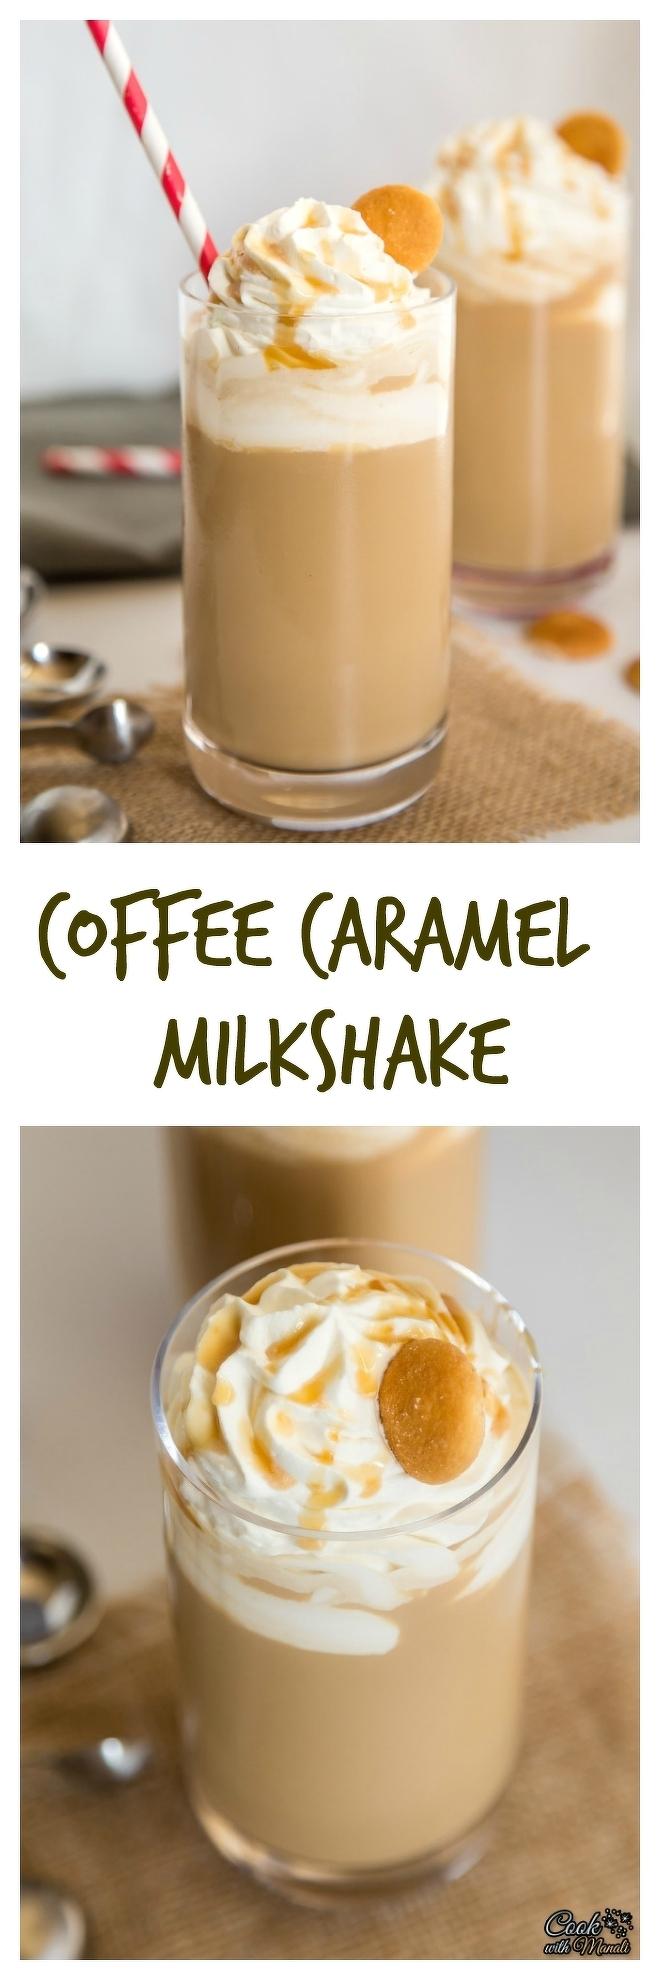 Coffee Caramel Milkshake is a refreshing summer treat